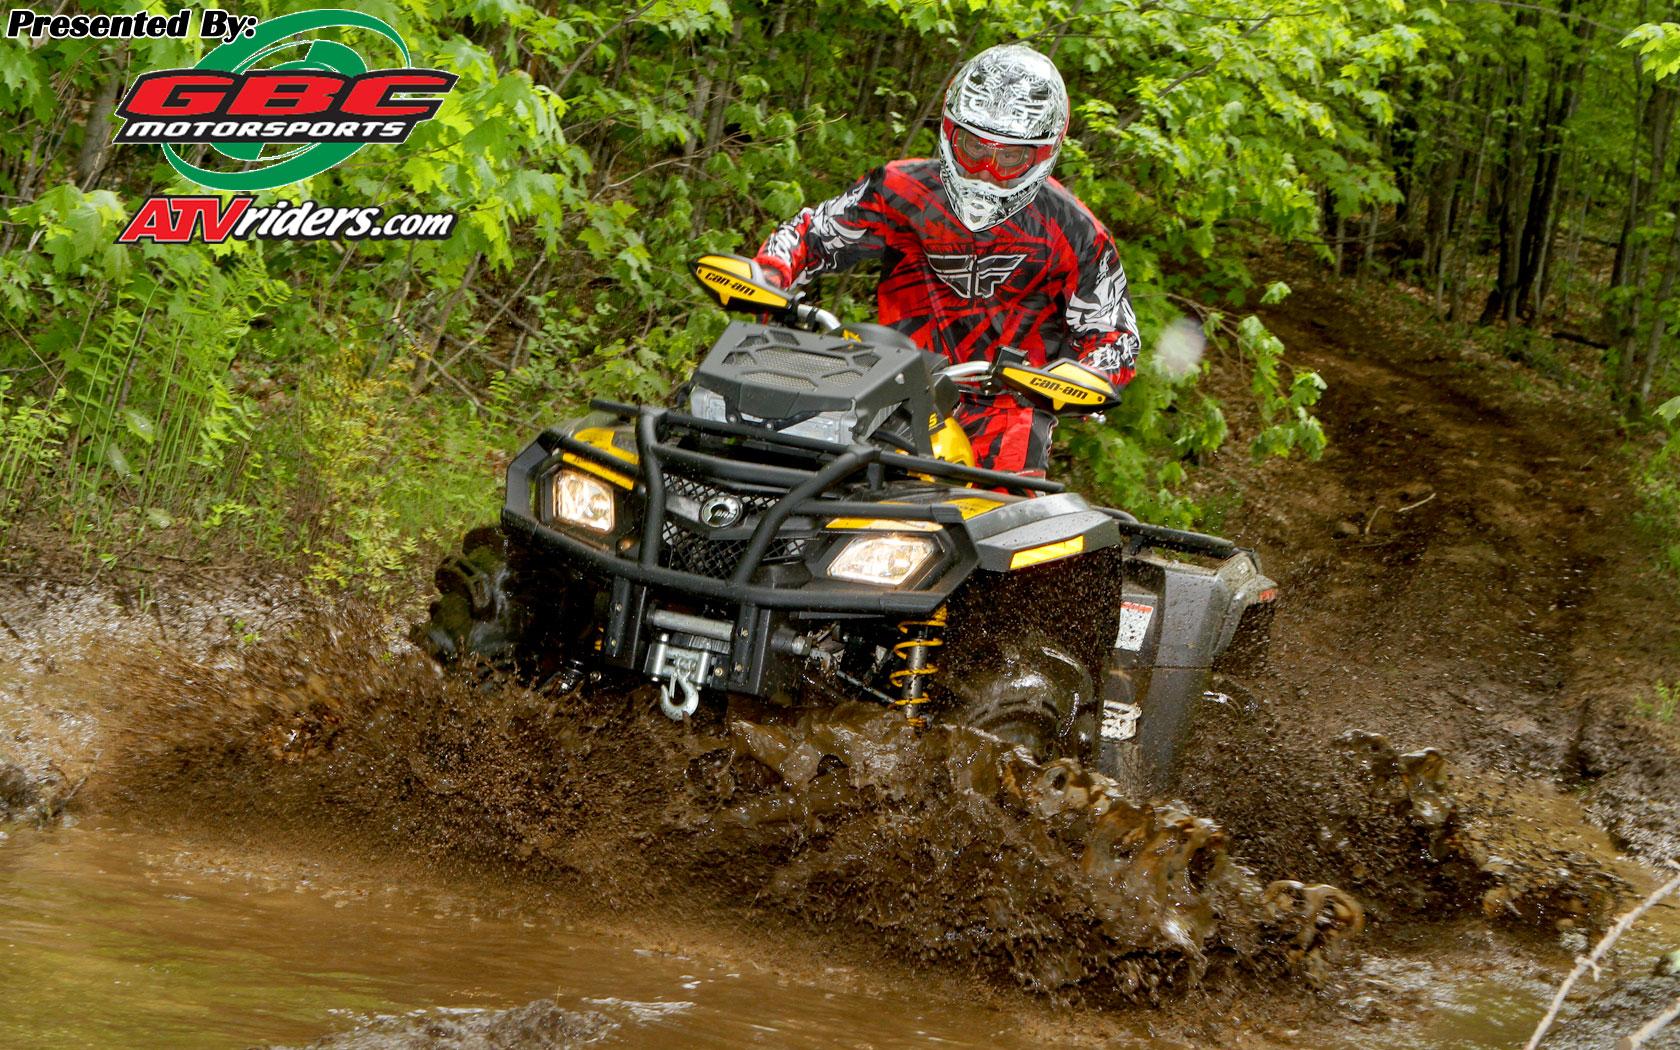 Atvs In Mud Mr mud performance 4x4 atv 1680x1050